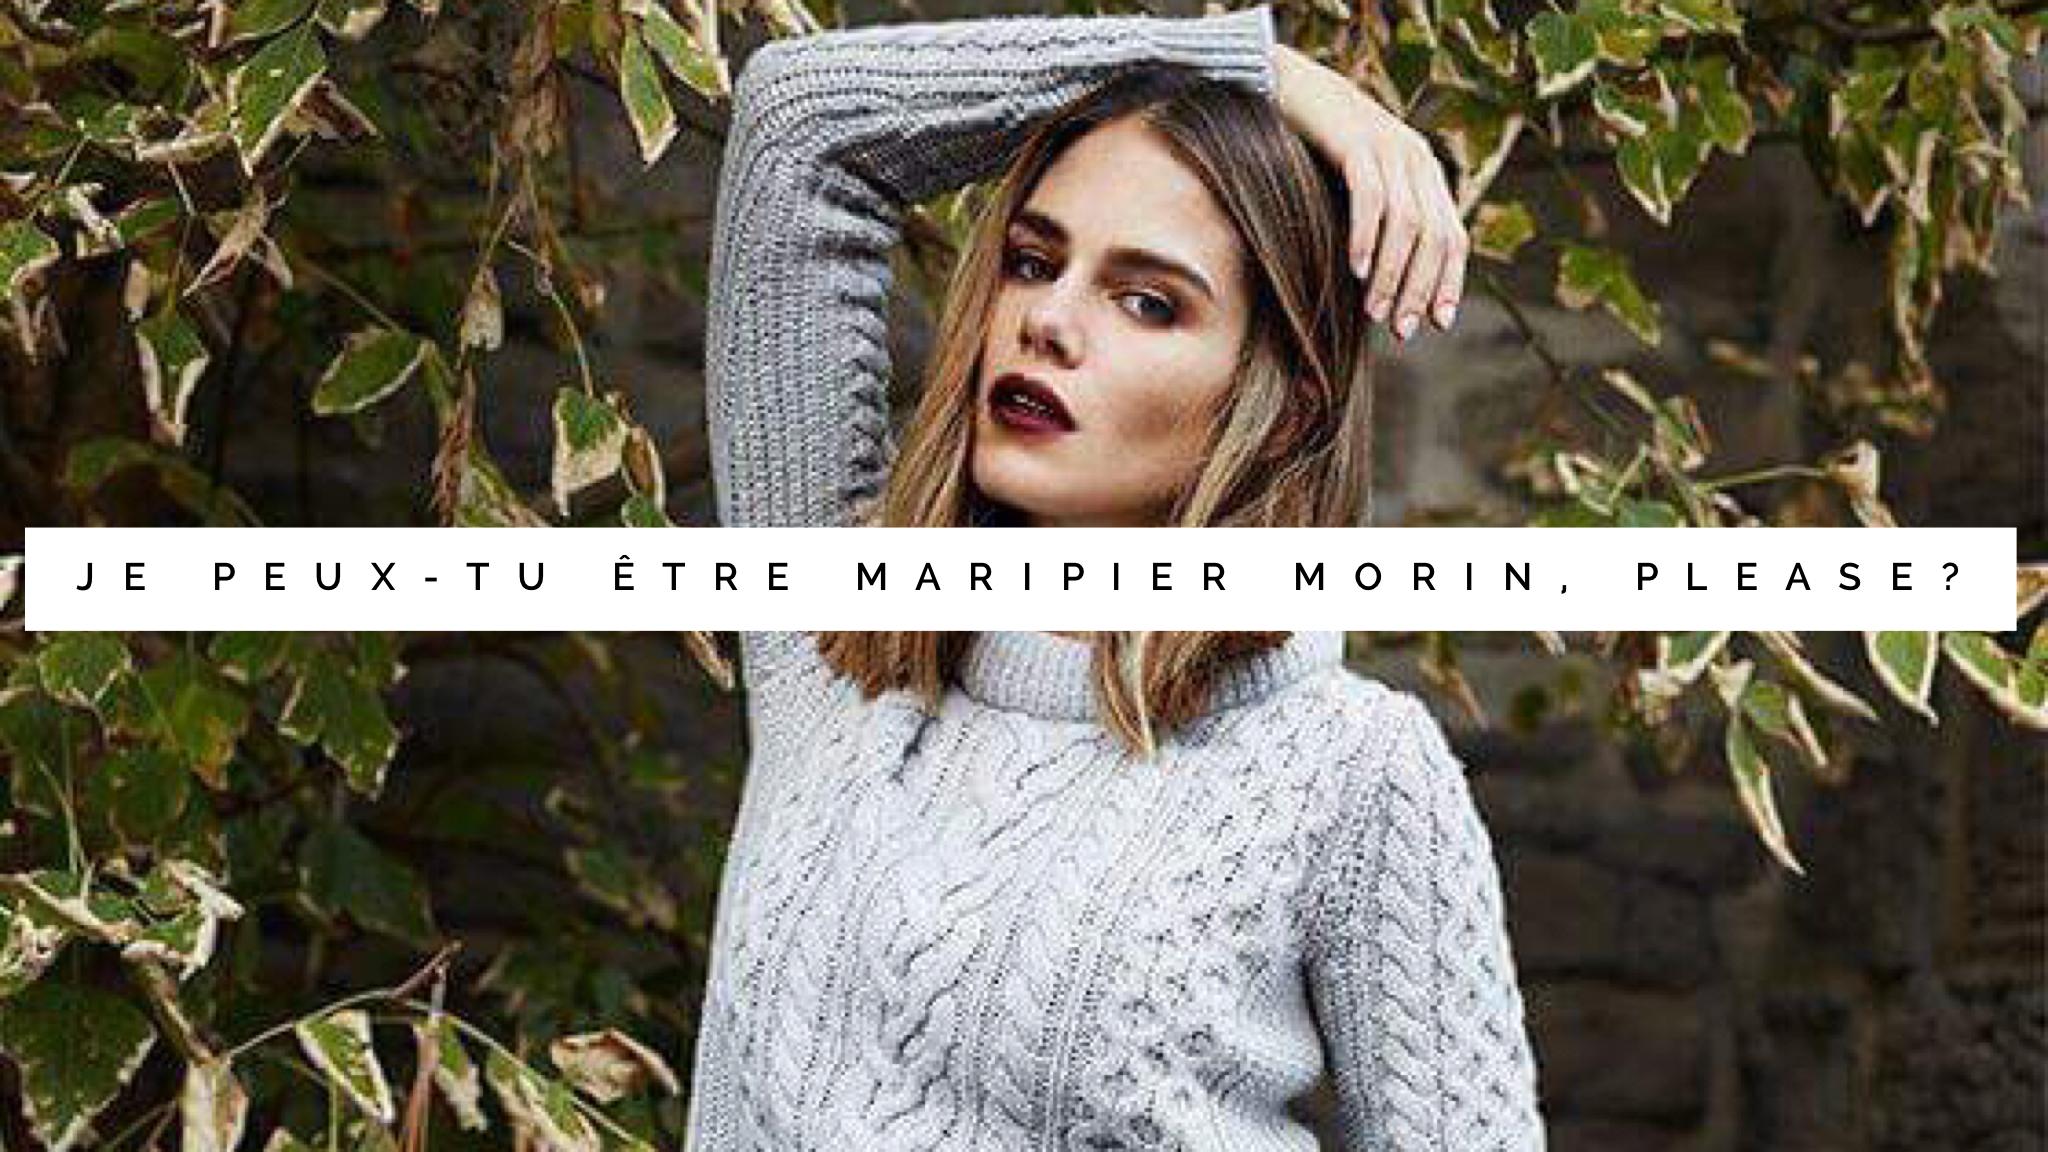 Jen parle de Maripier Morin